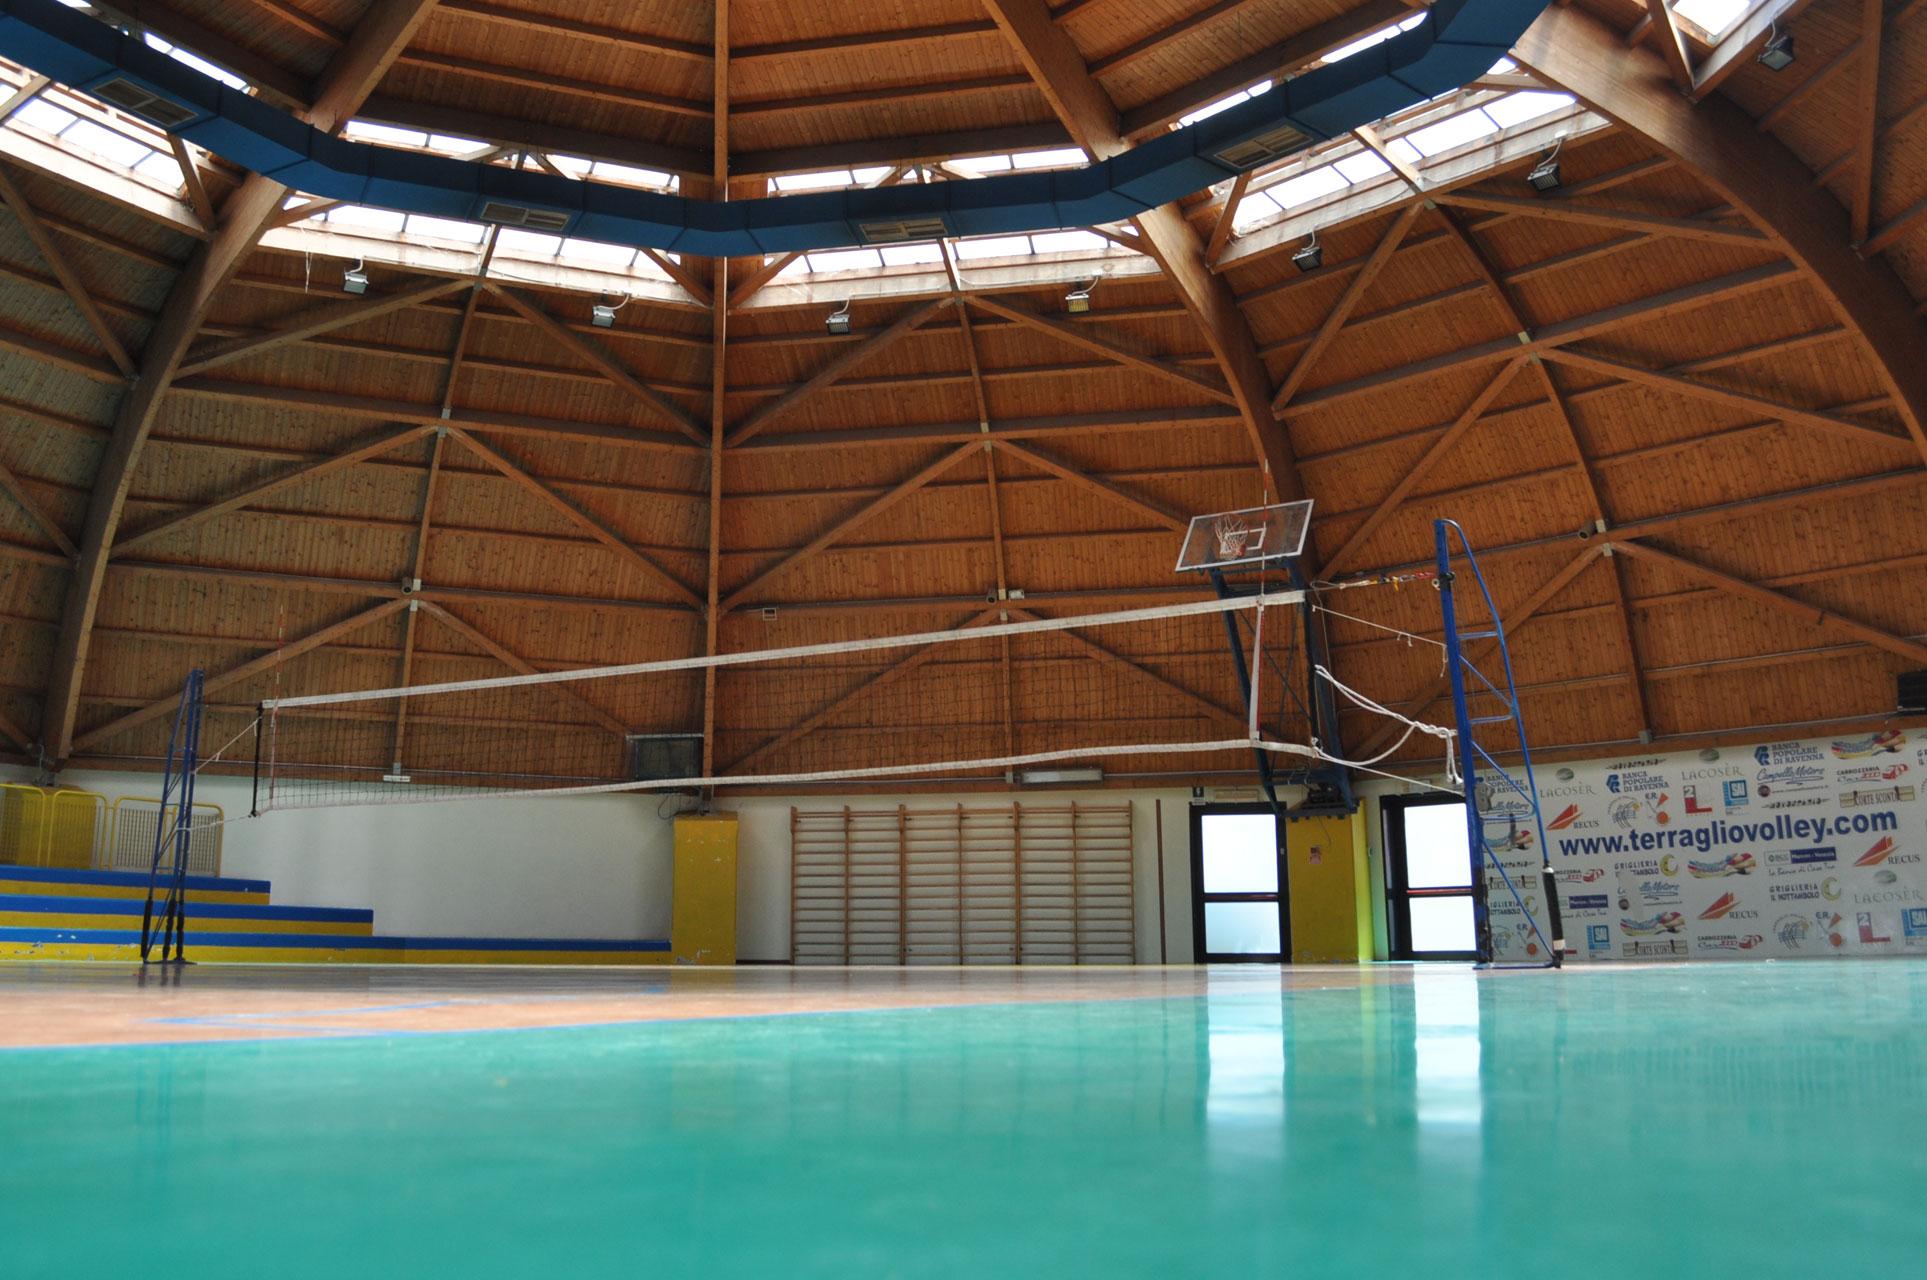 Piscina Sant Alvise Venezia.Palestre Terraglio Volley